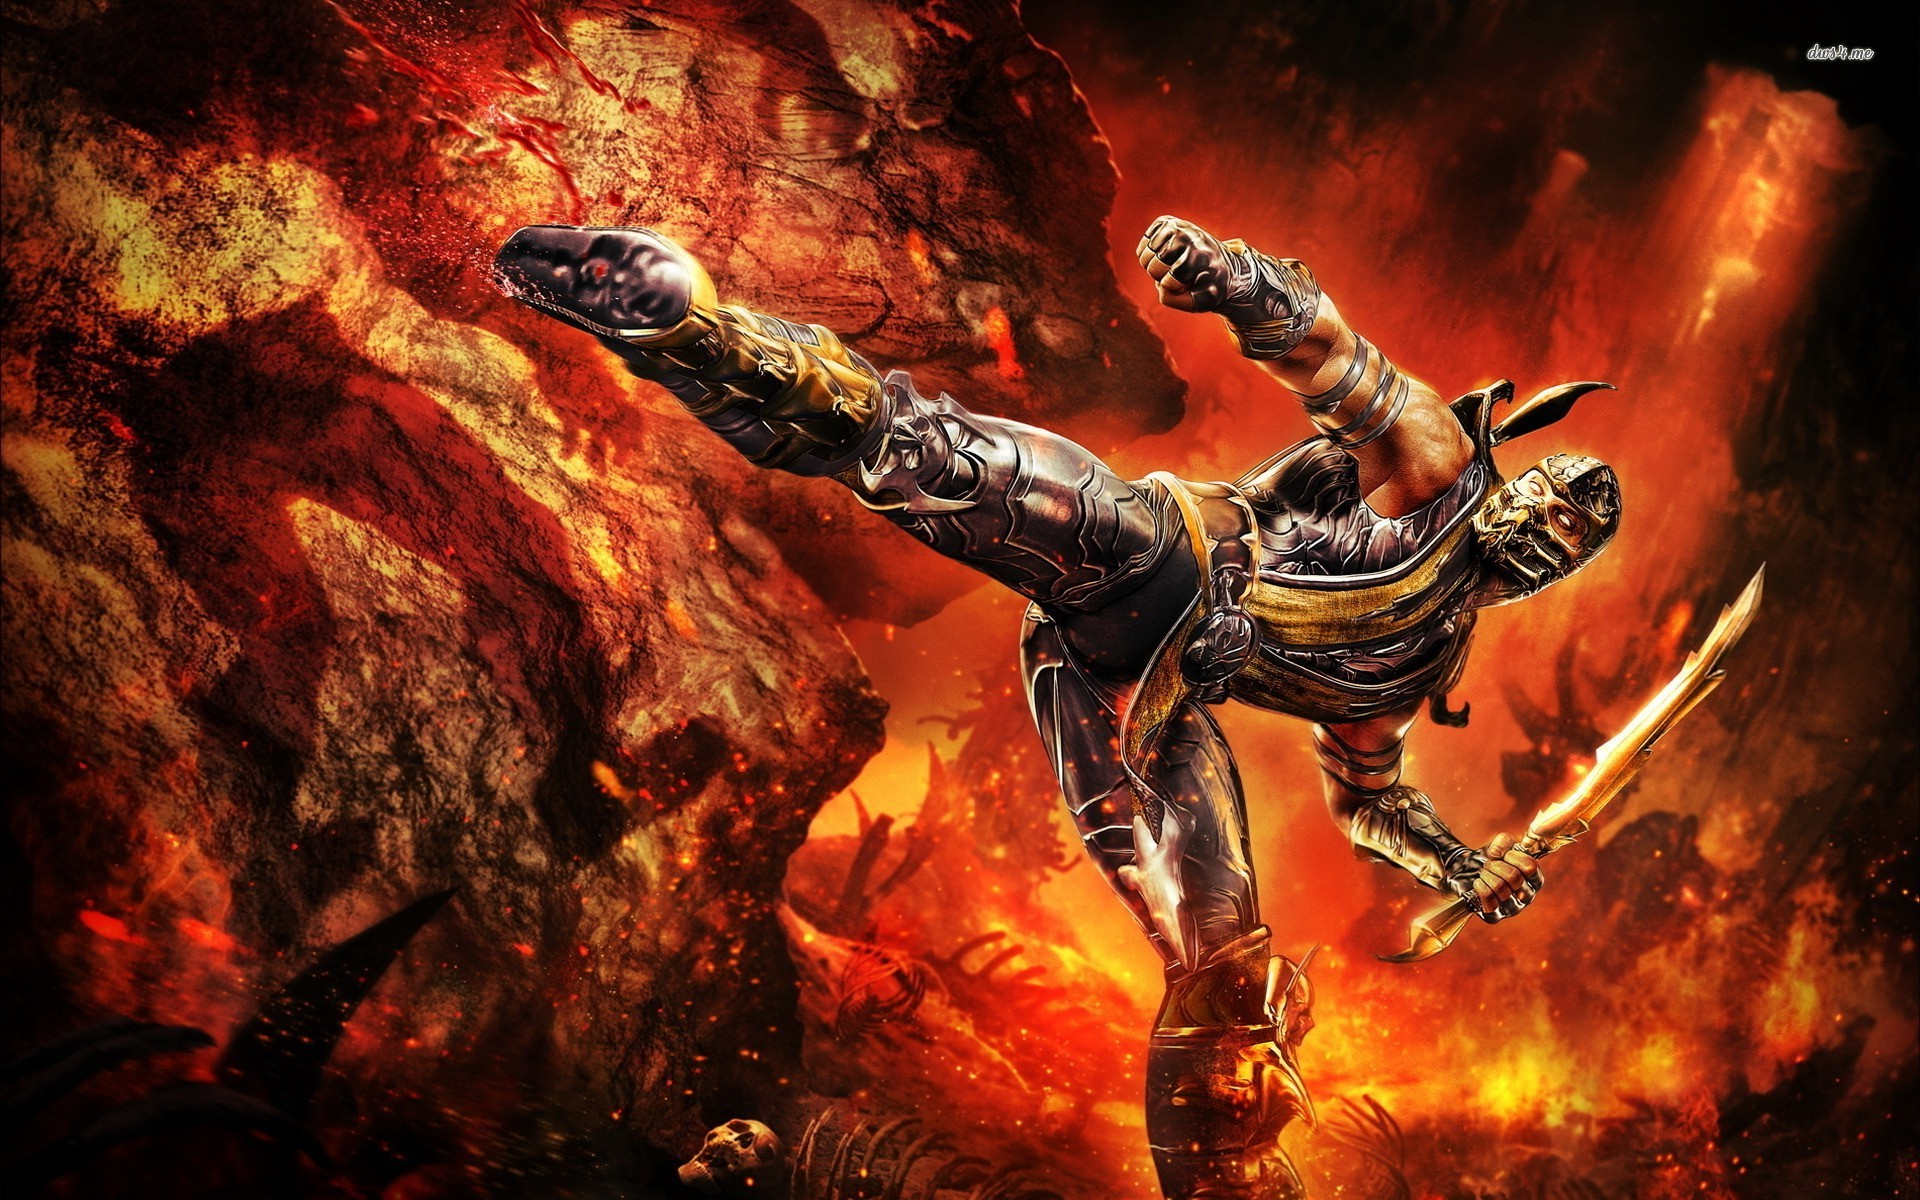 Scorpion   Mortal Kombat wallpaper   Game wallpapers   20085 1920x1200